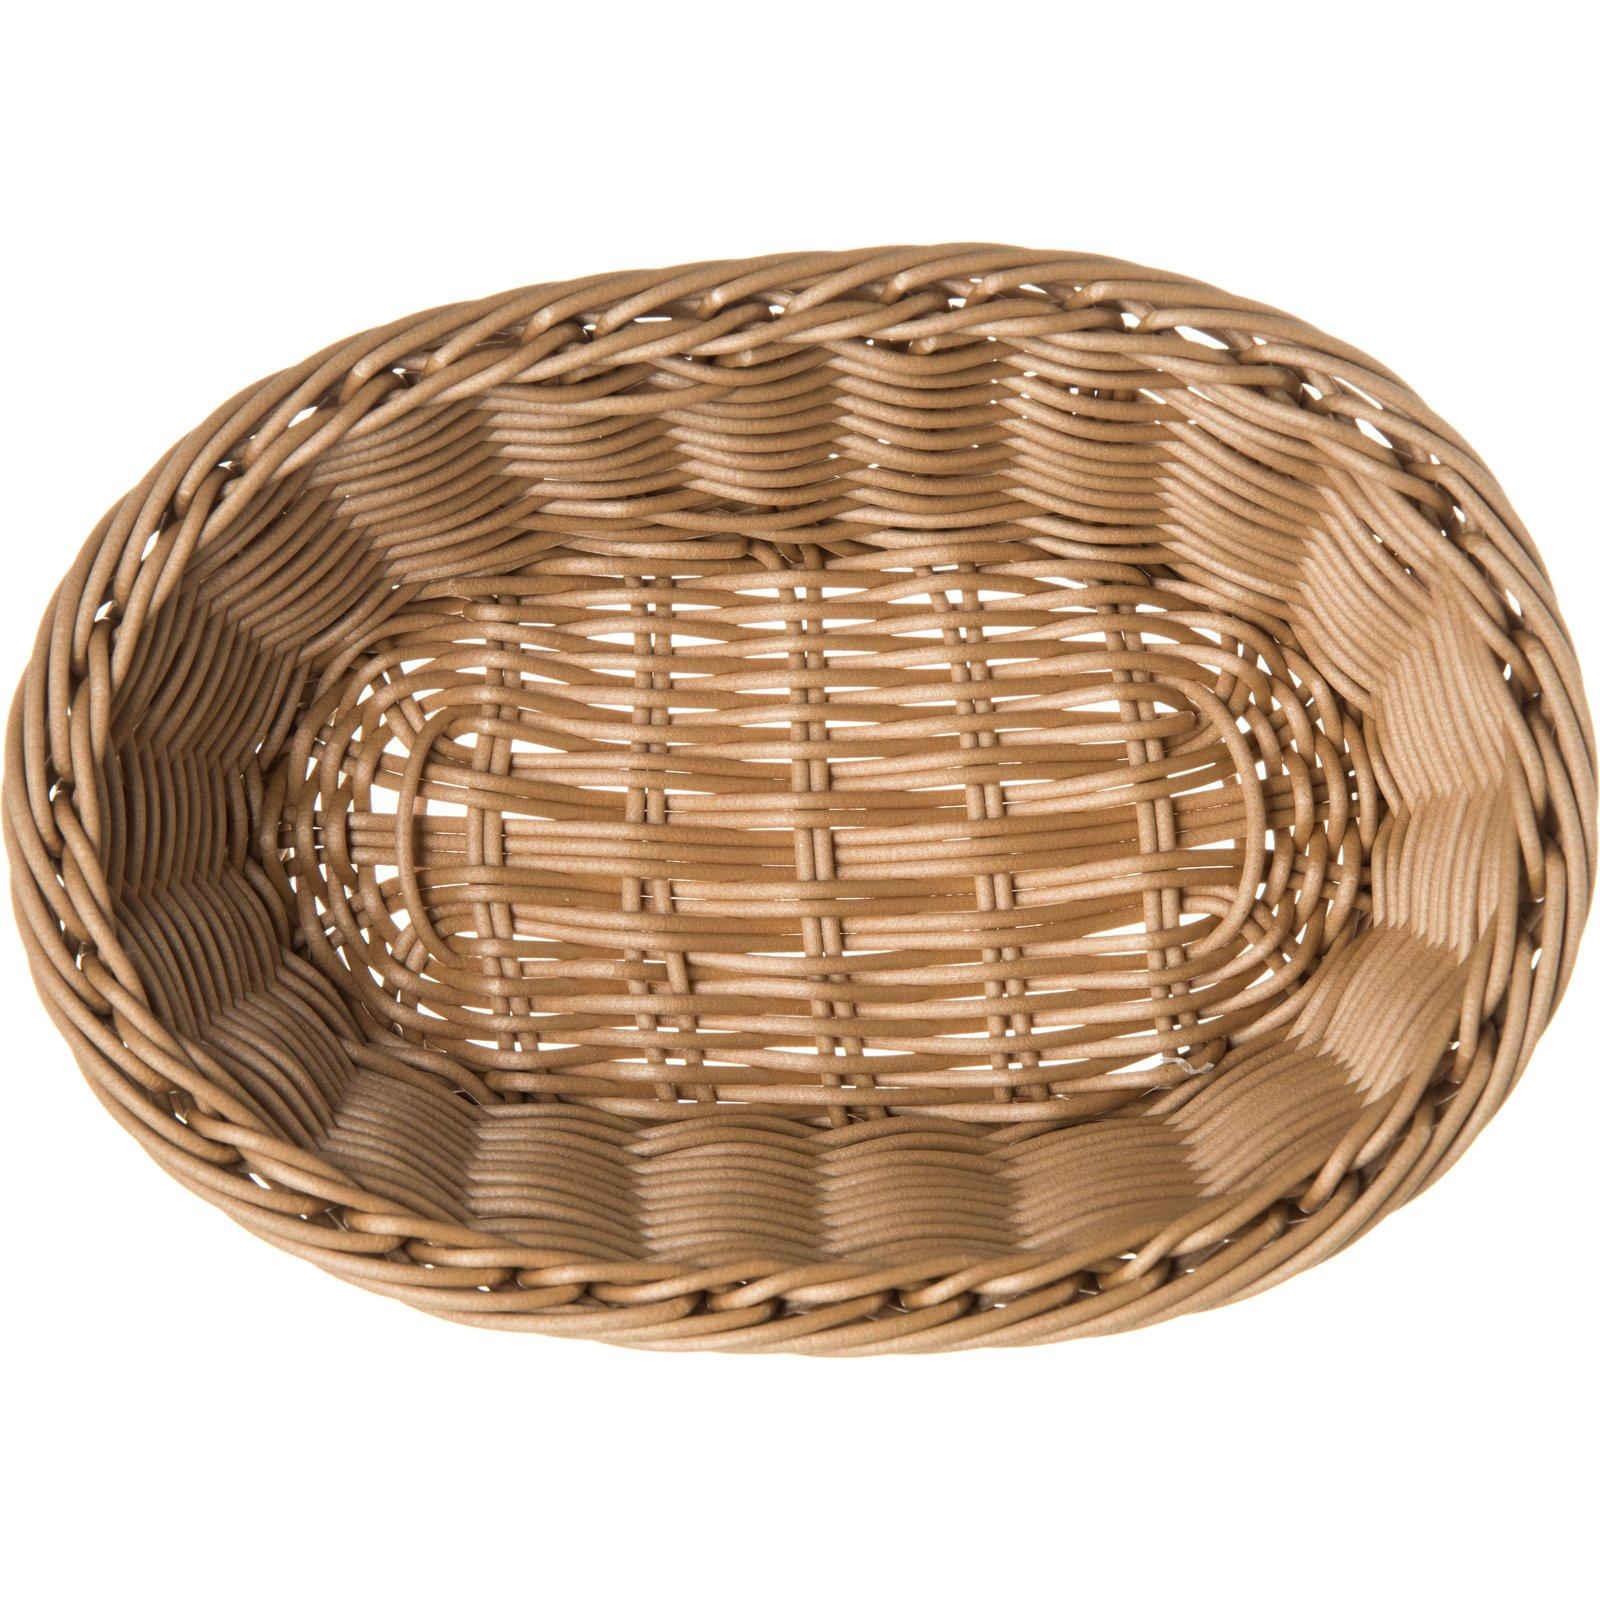 "655025 - Woven Baskets Oval Basket Small 9"" - Caramel ..."